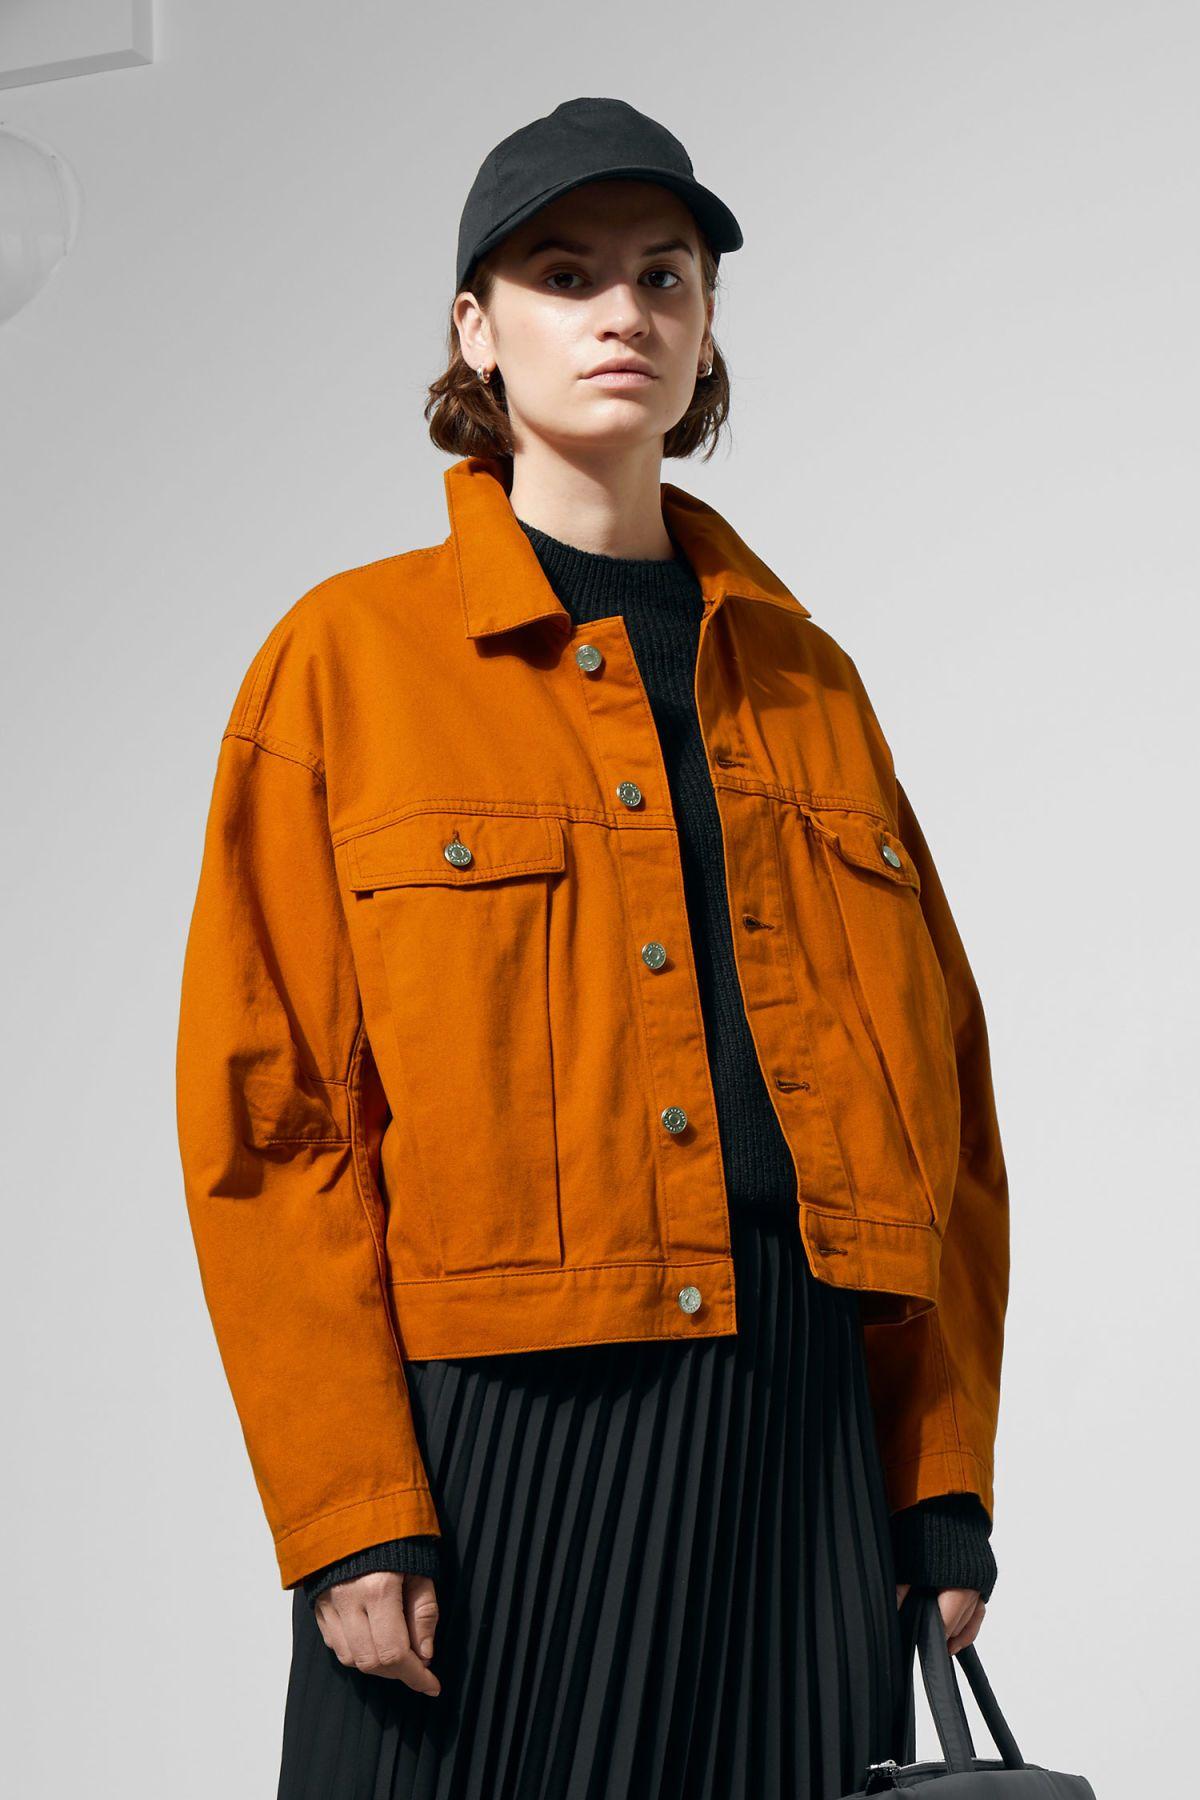 3cebf29615a86 Arezzo Jacket - Beige - Jackets in 2019 | New style | Jackets, Denim